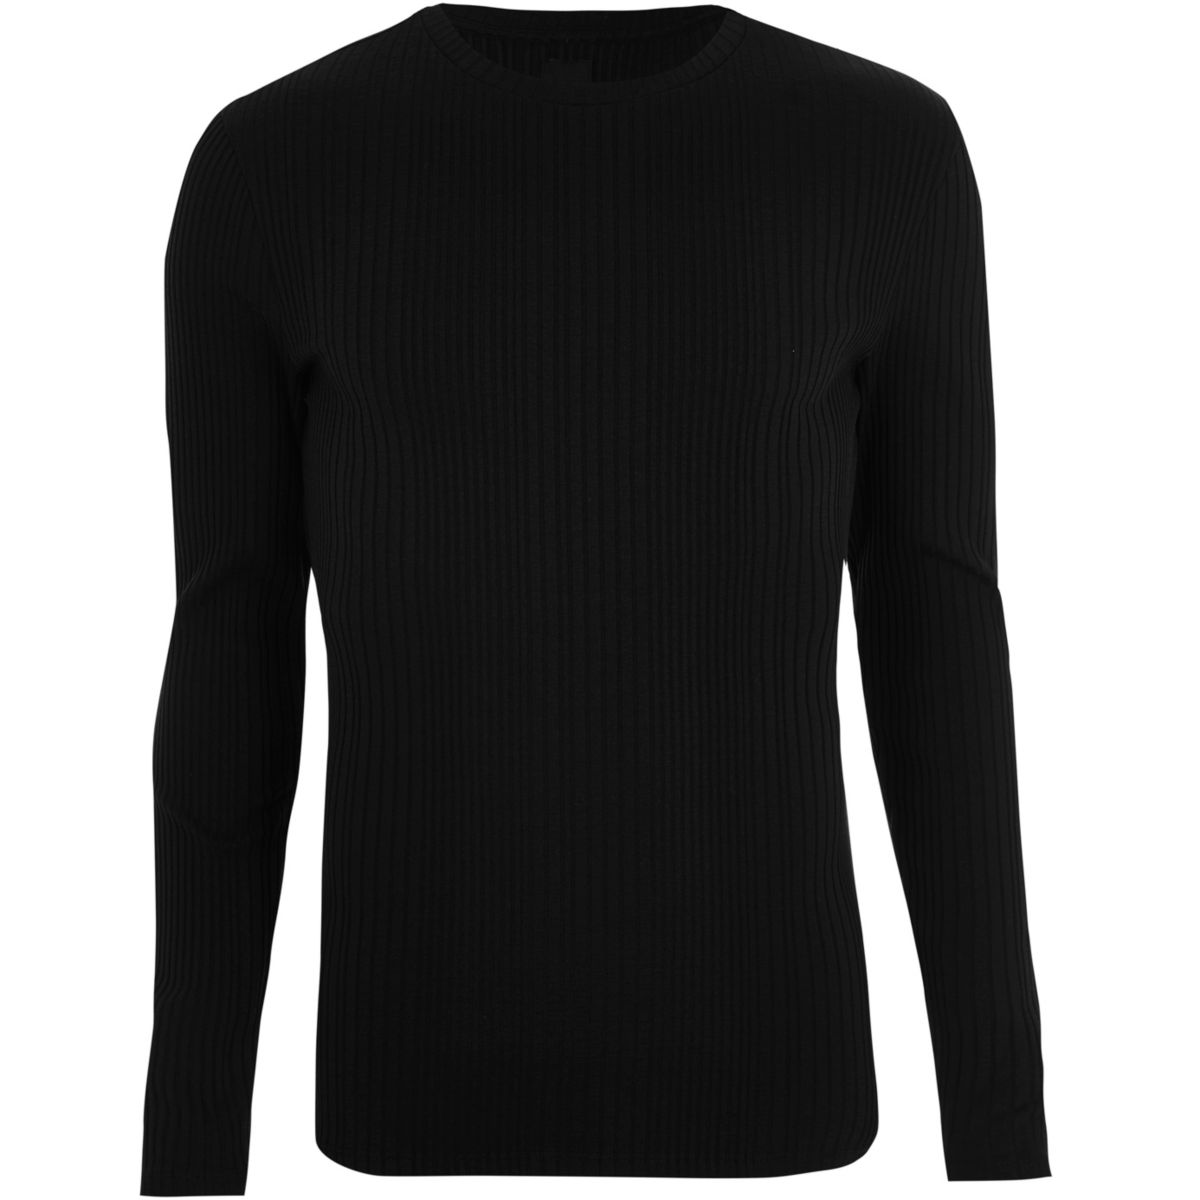 Zwart geribbeld T-shirt met lange mouwen